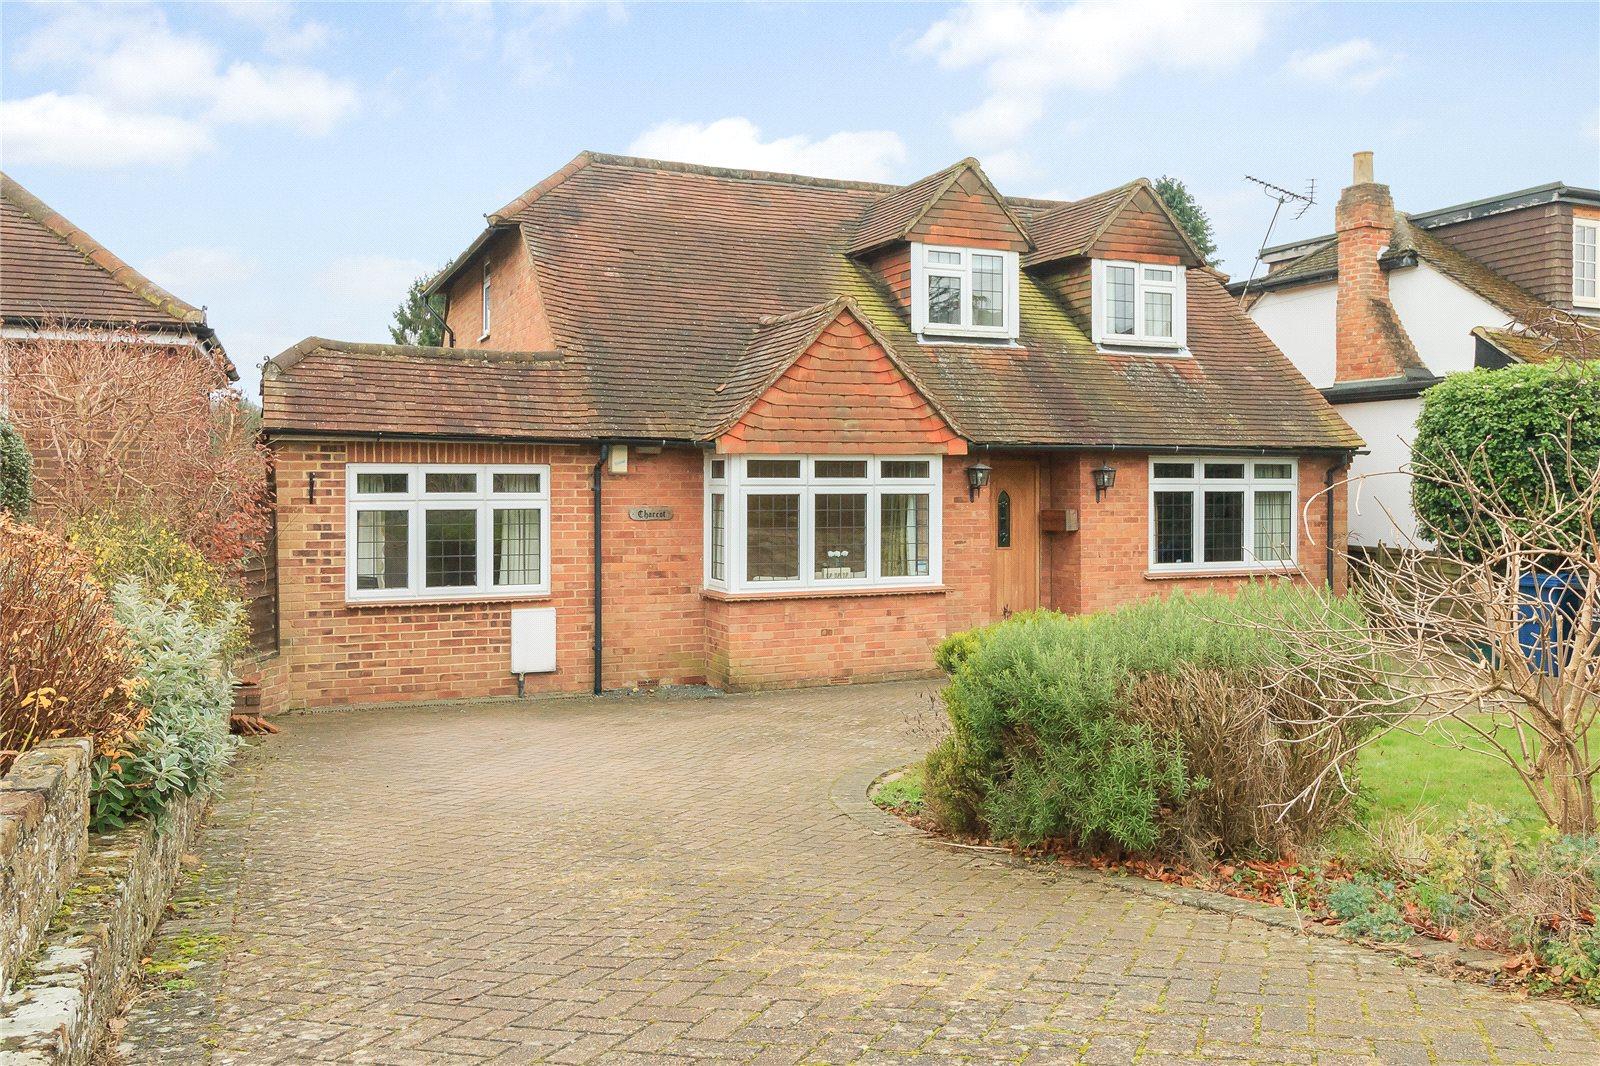 Casa para uma família para Venda às Nortoft Road, Chalfont St Peter, Buckinghamshire, SL9 Chalfont St Peter, Inglaterra